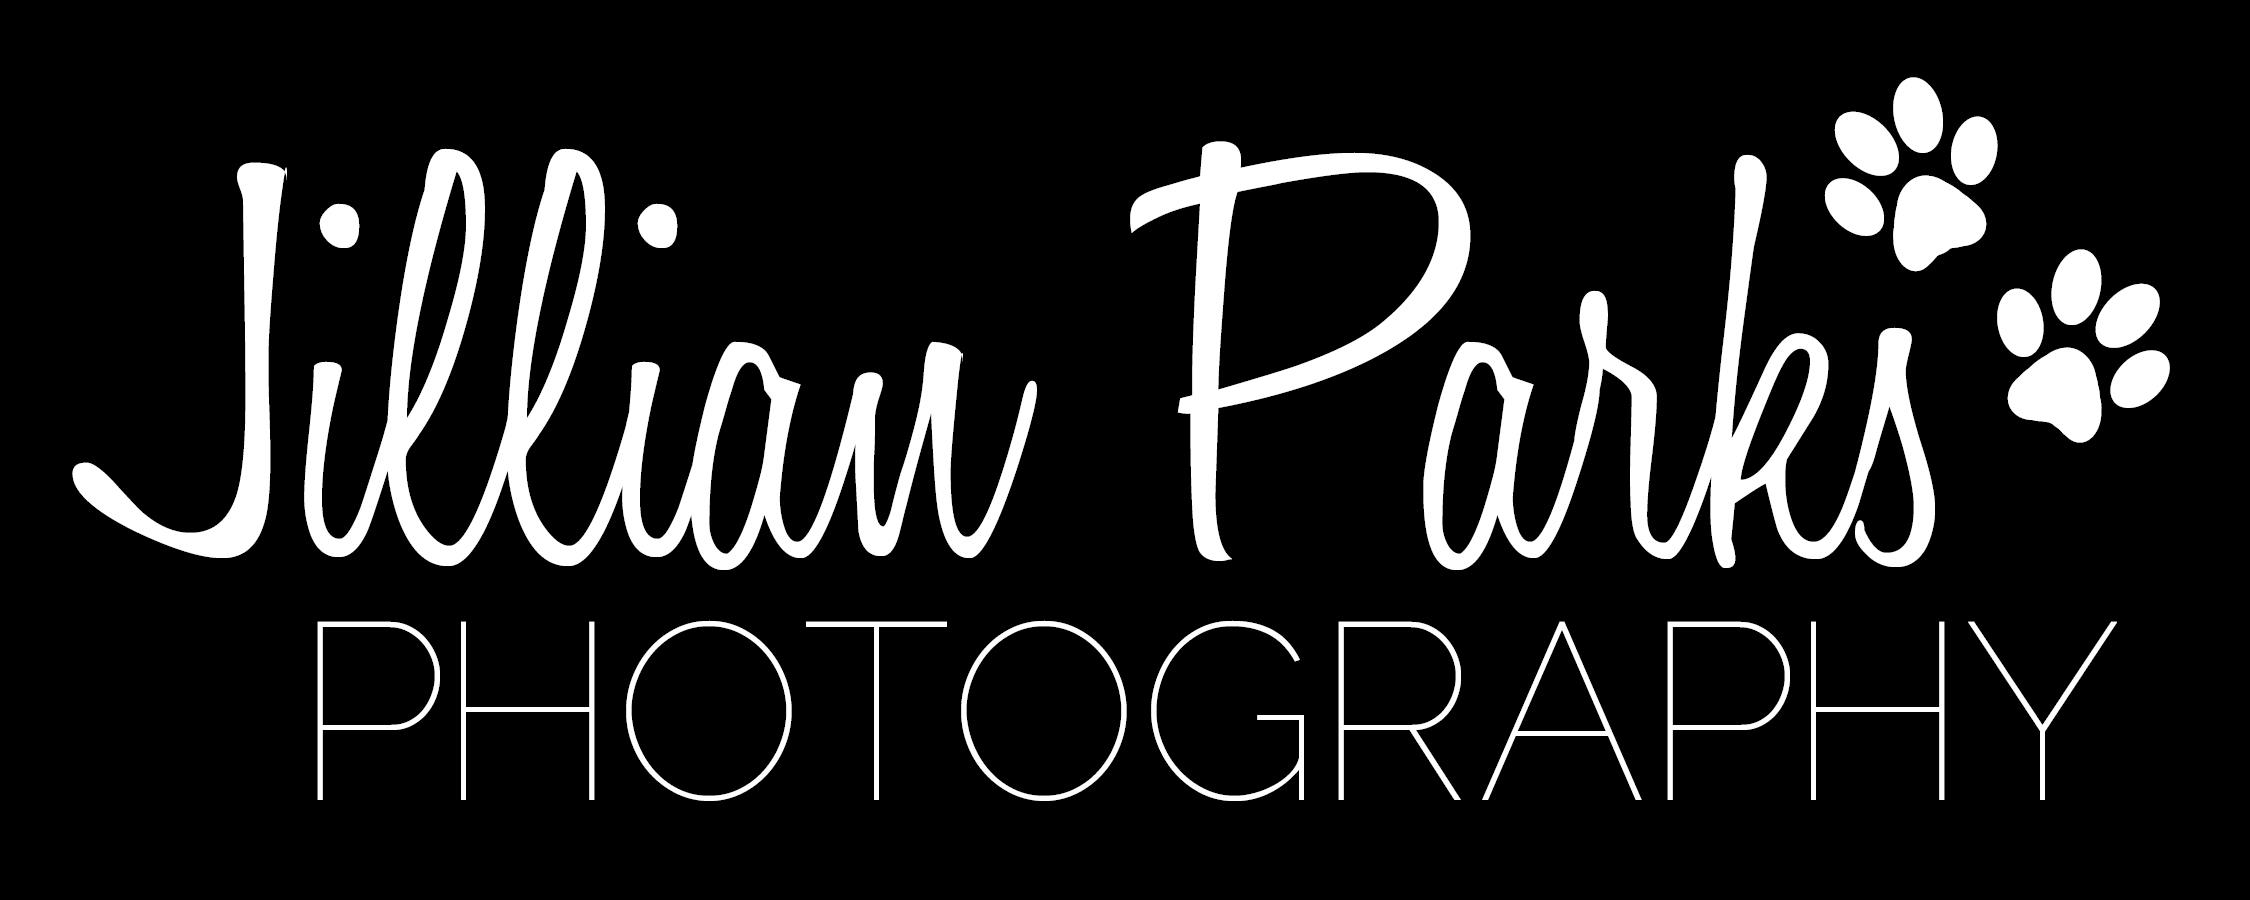 Jillian Parks Photography